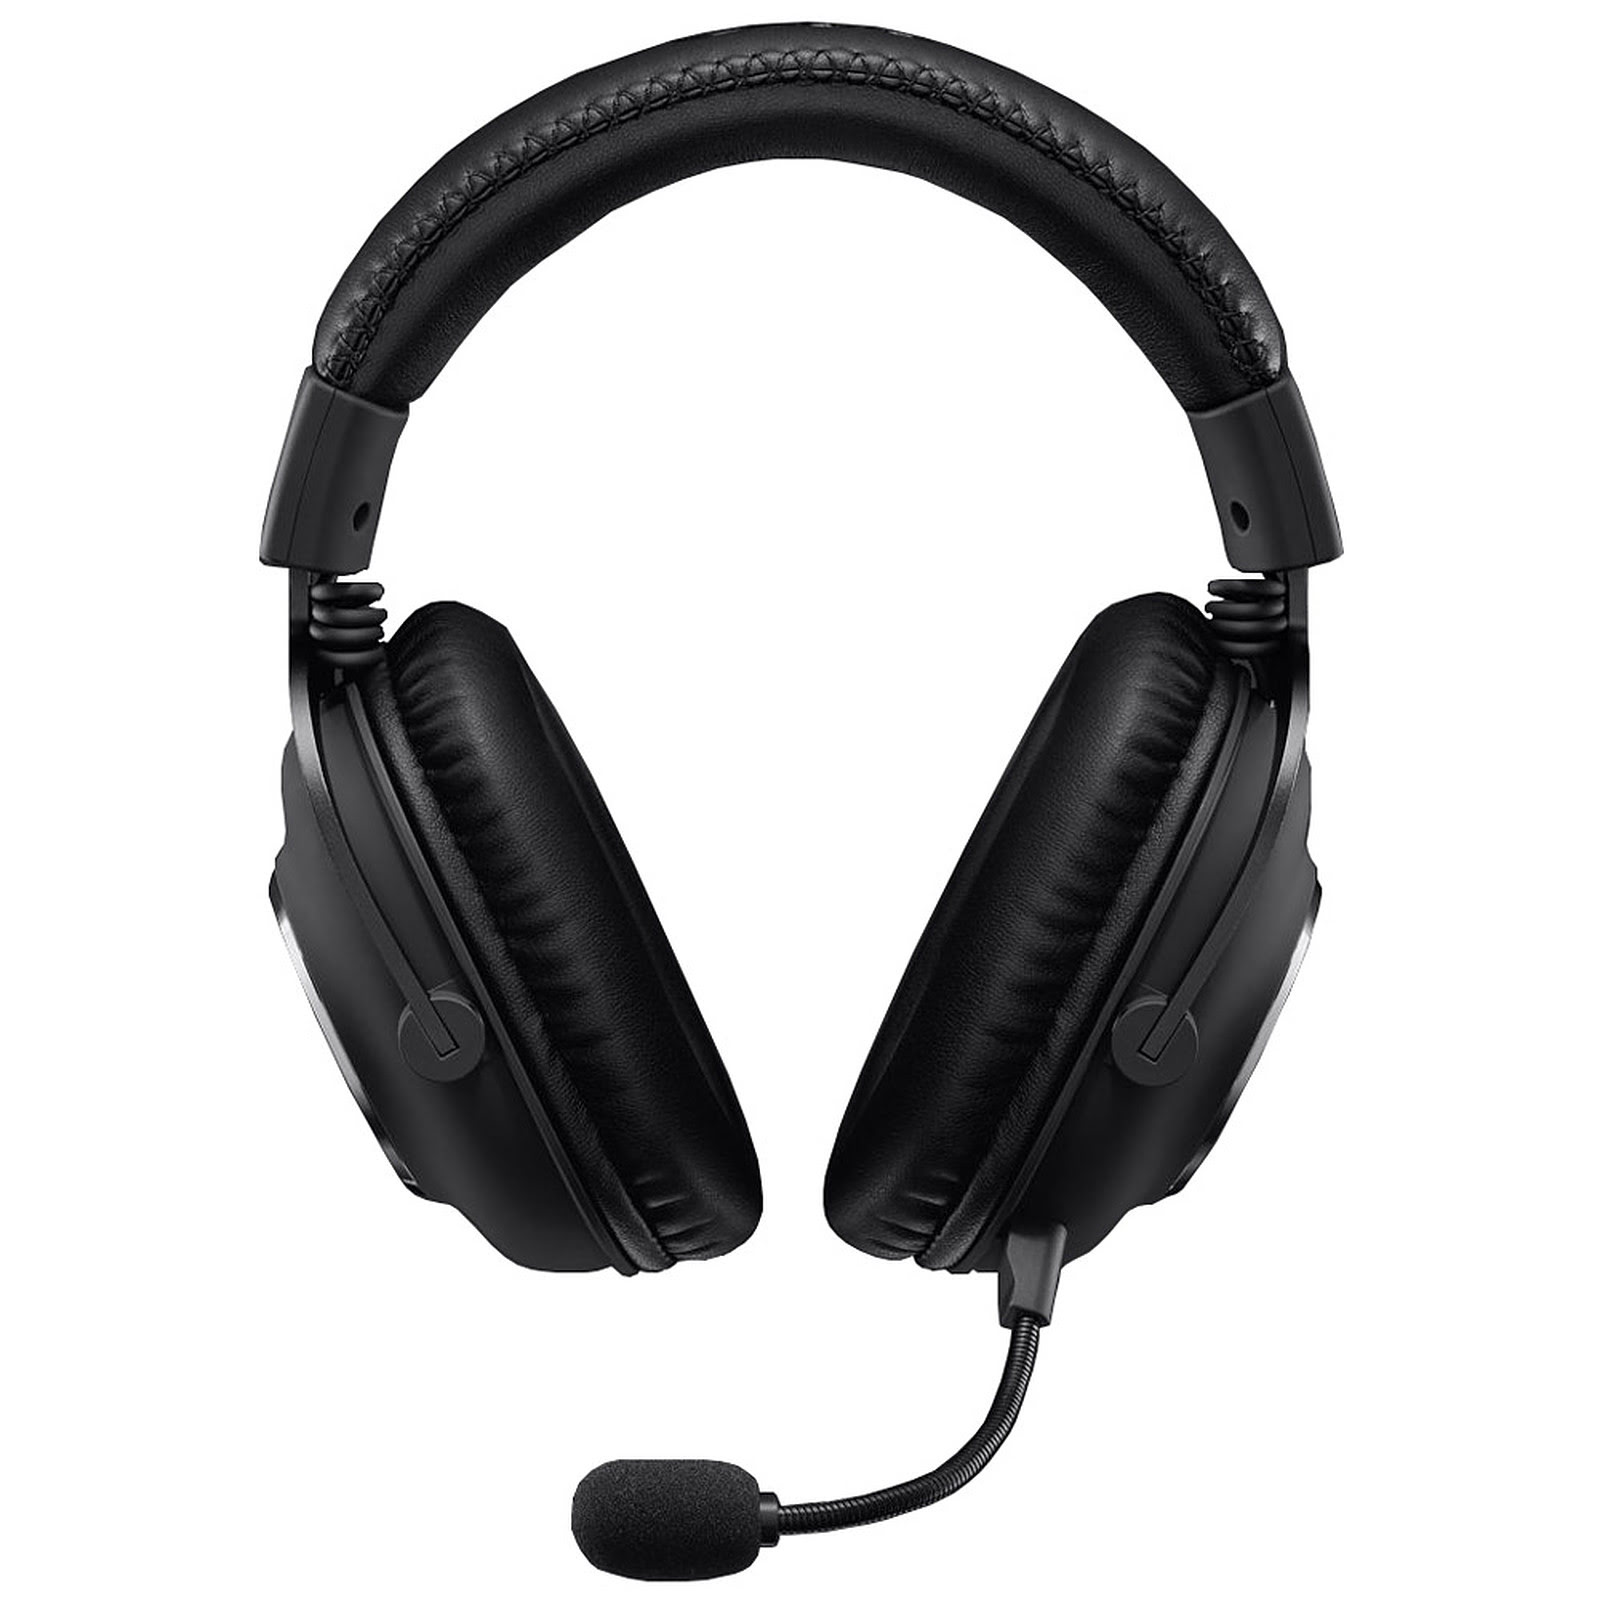 Logitech G PRO X Gaming Headset 7.1 Surround Noir - Micro-casque - 1